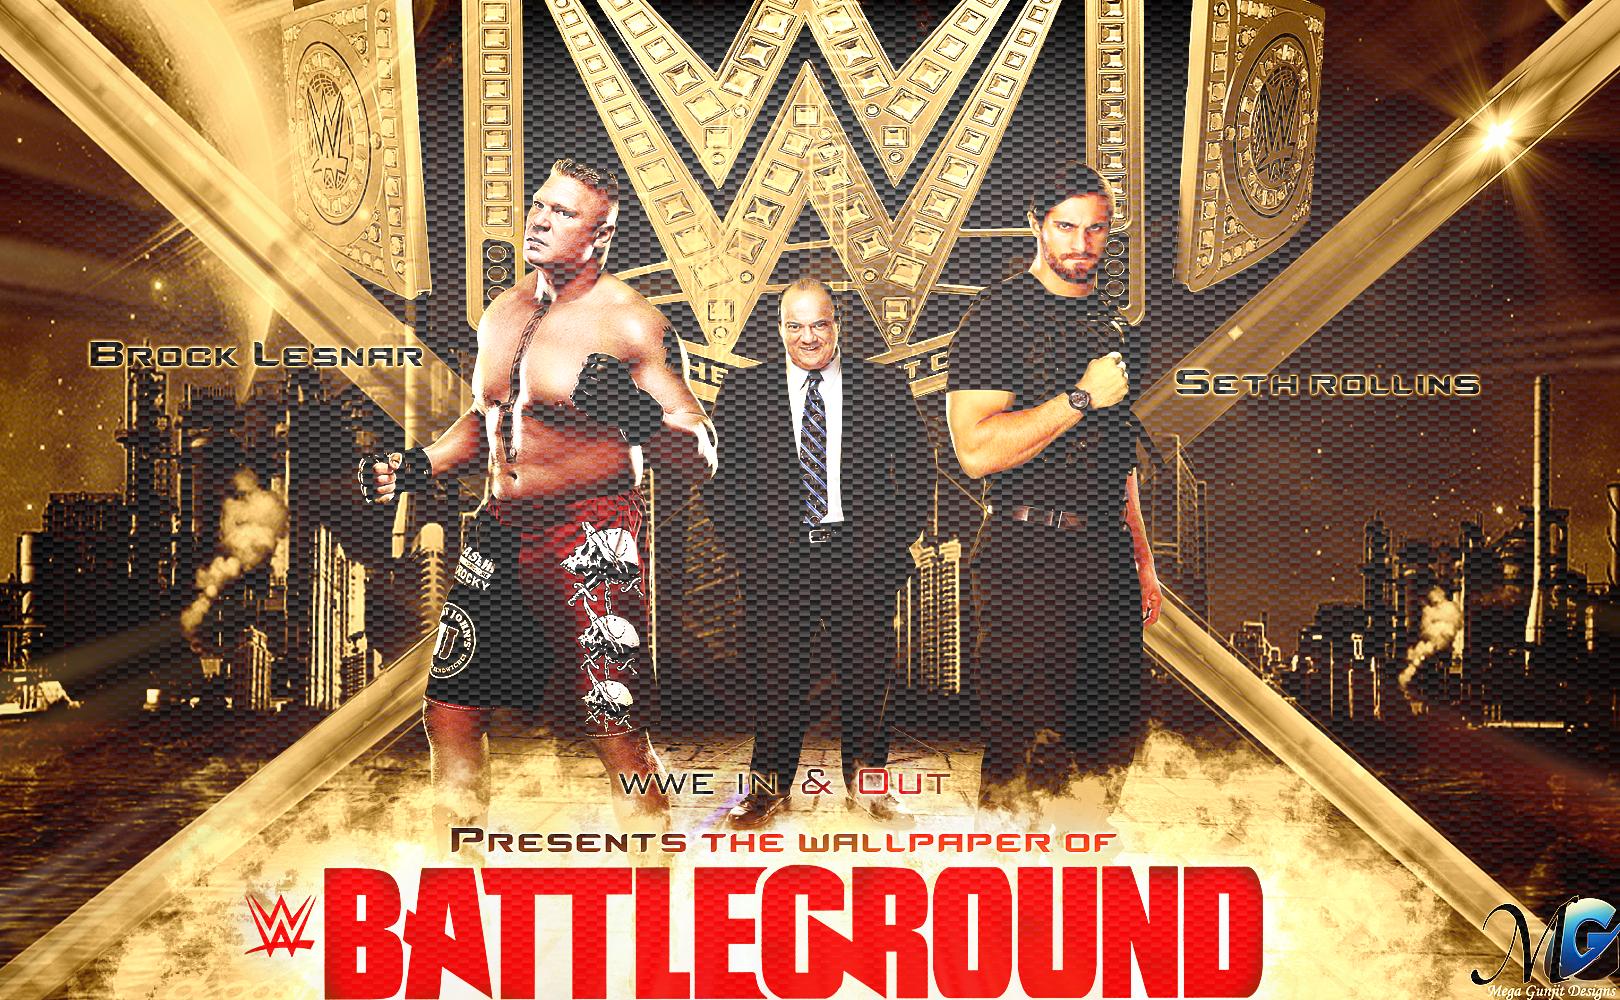 Brock Lesnar VS Seth Rollins HD Wallpaper By Megagunjit